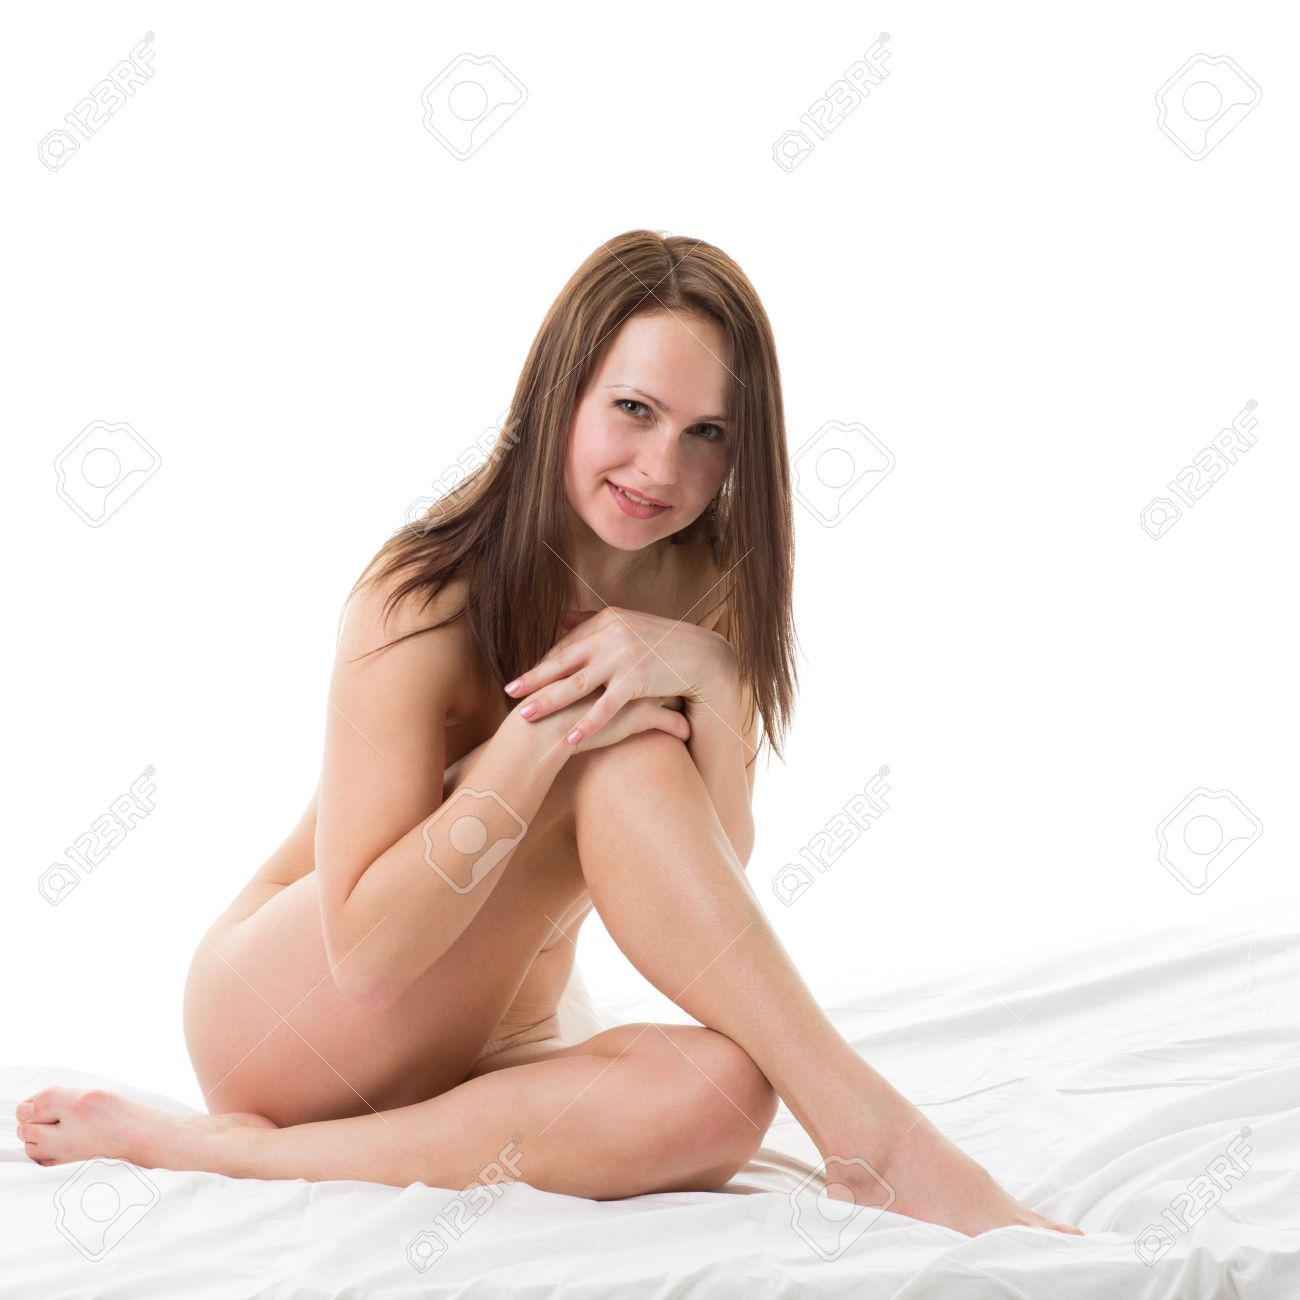 Bad girls movie porn vintage